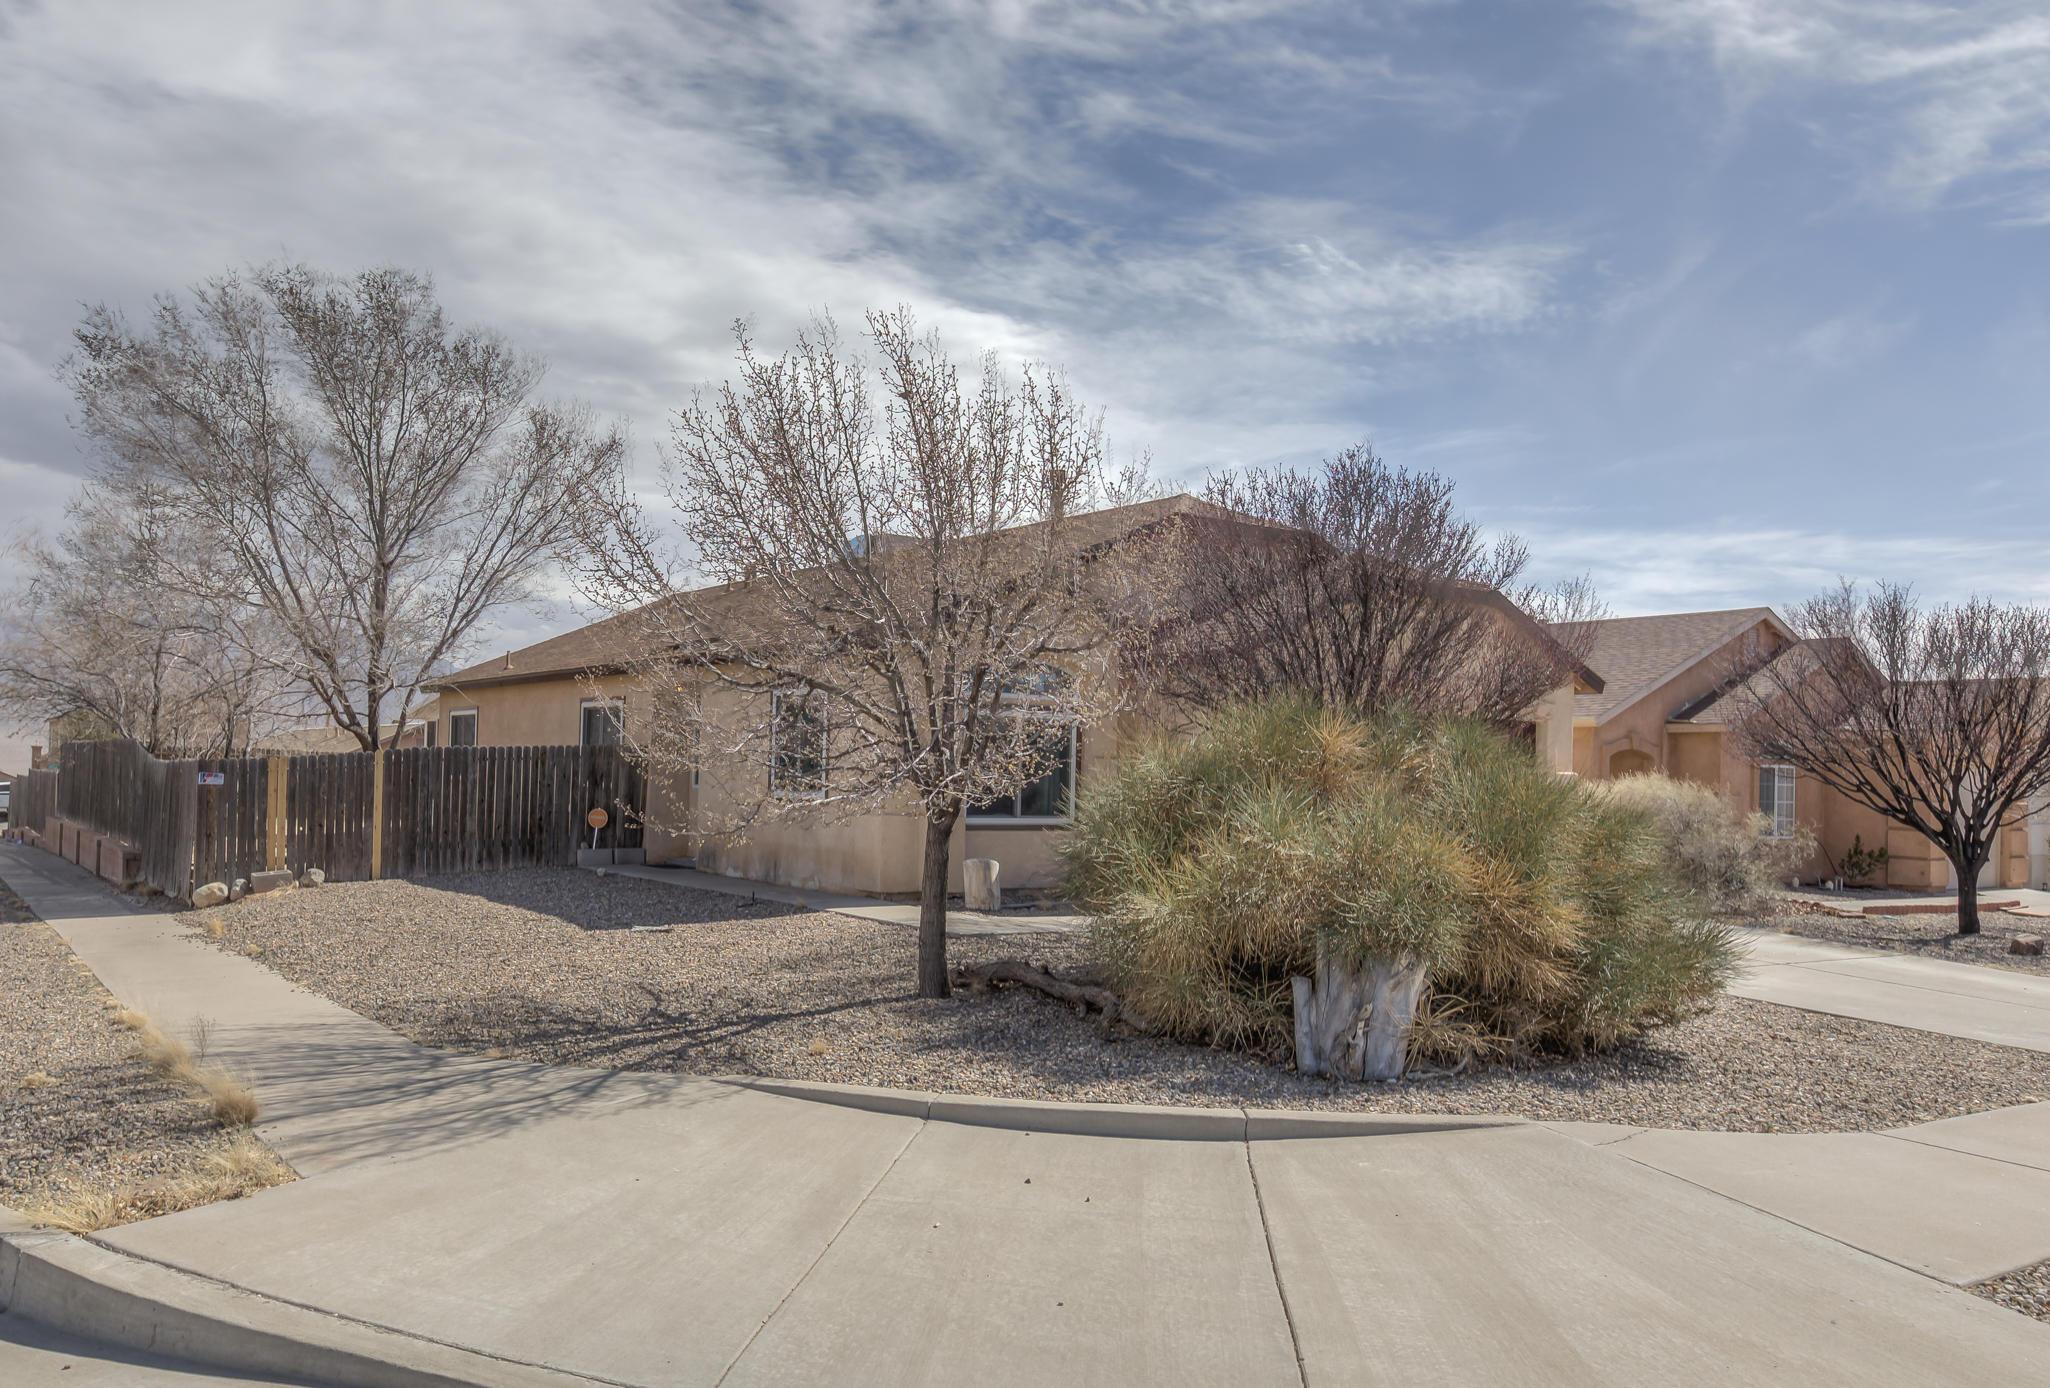 4764 NE Delaina Drive, Rio Rancho in Sandoval County, NM 87144 Home for Sale